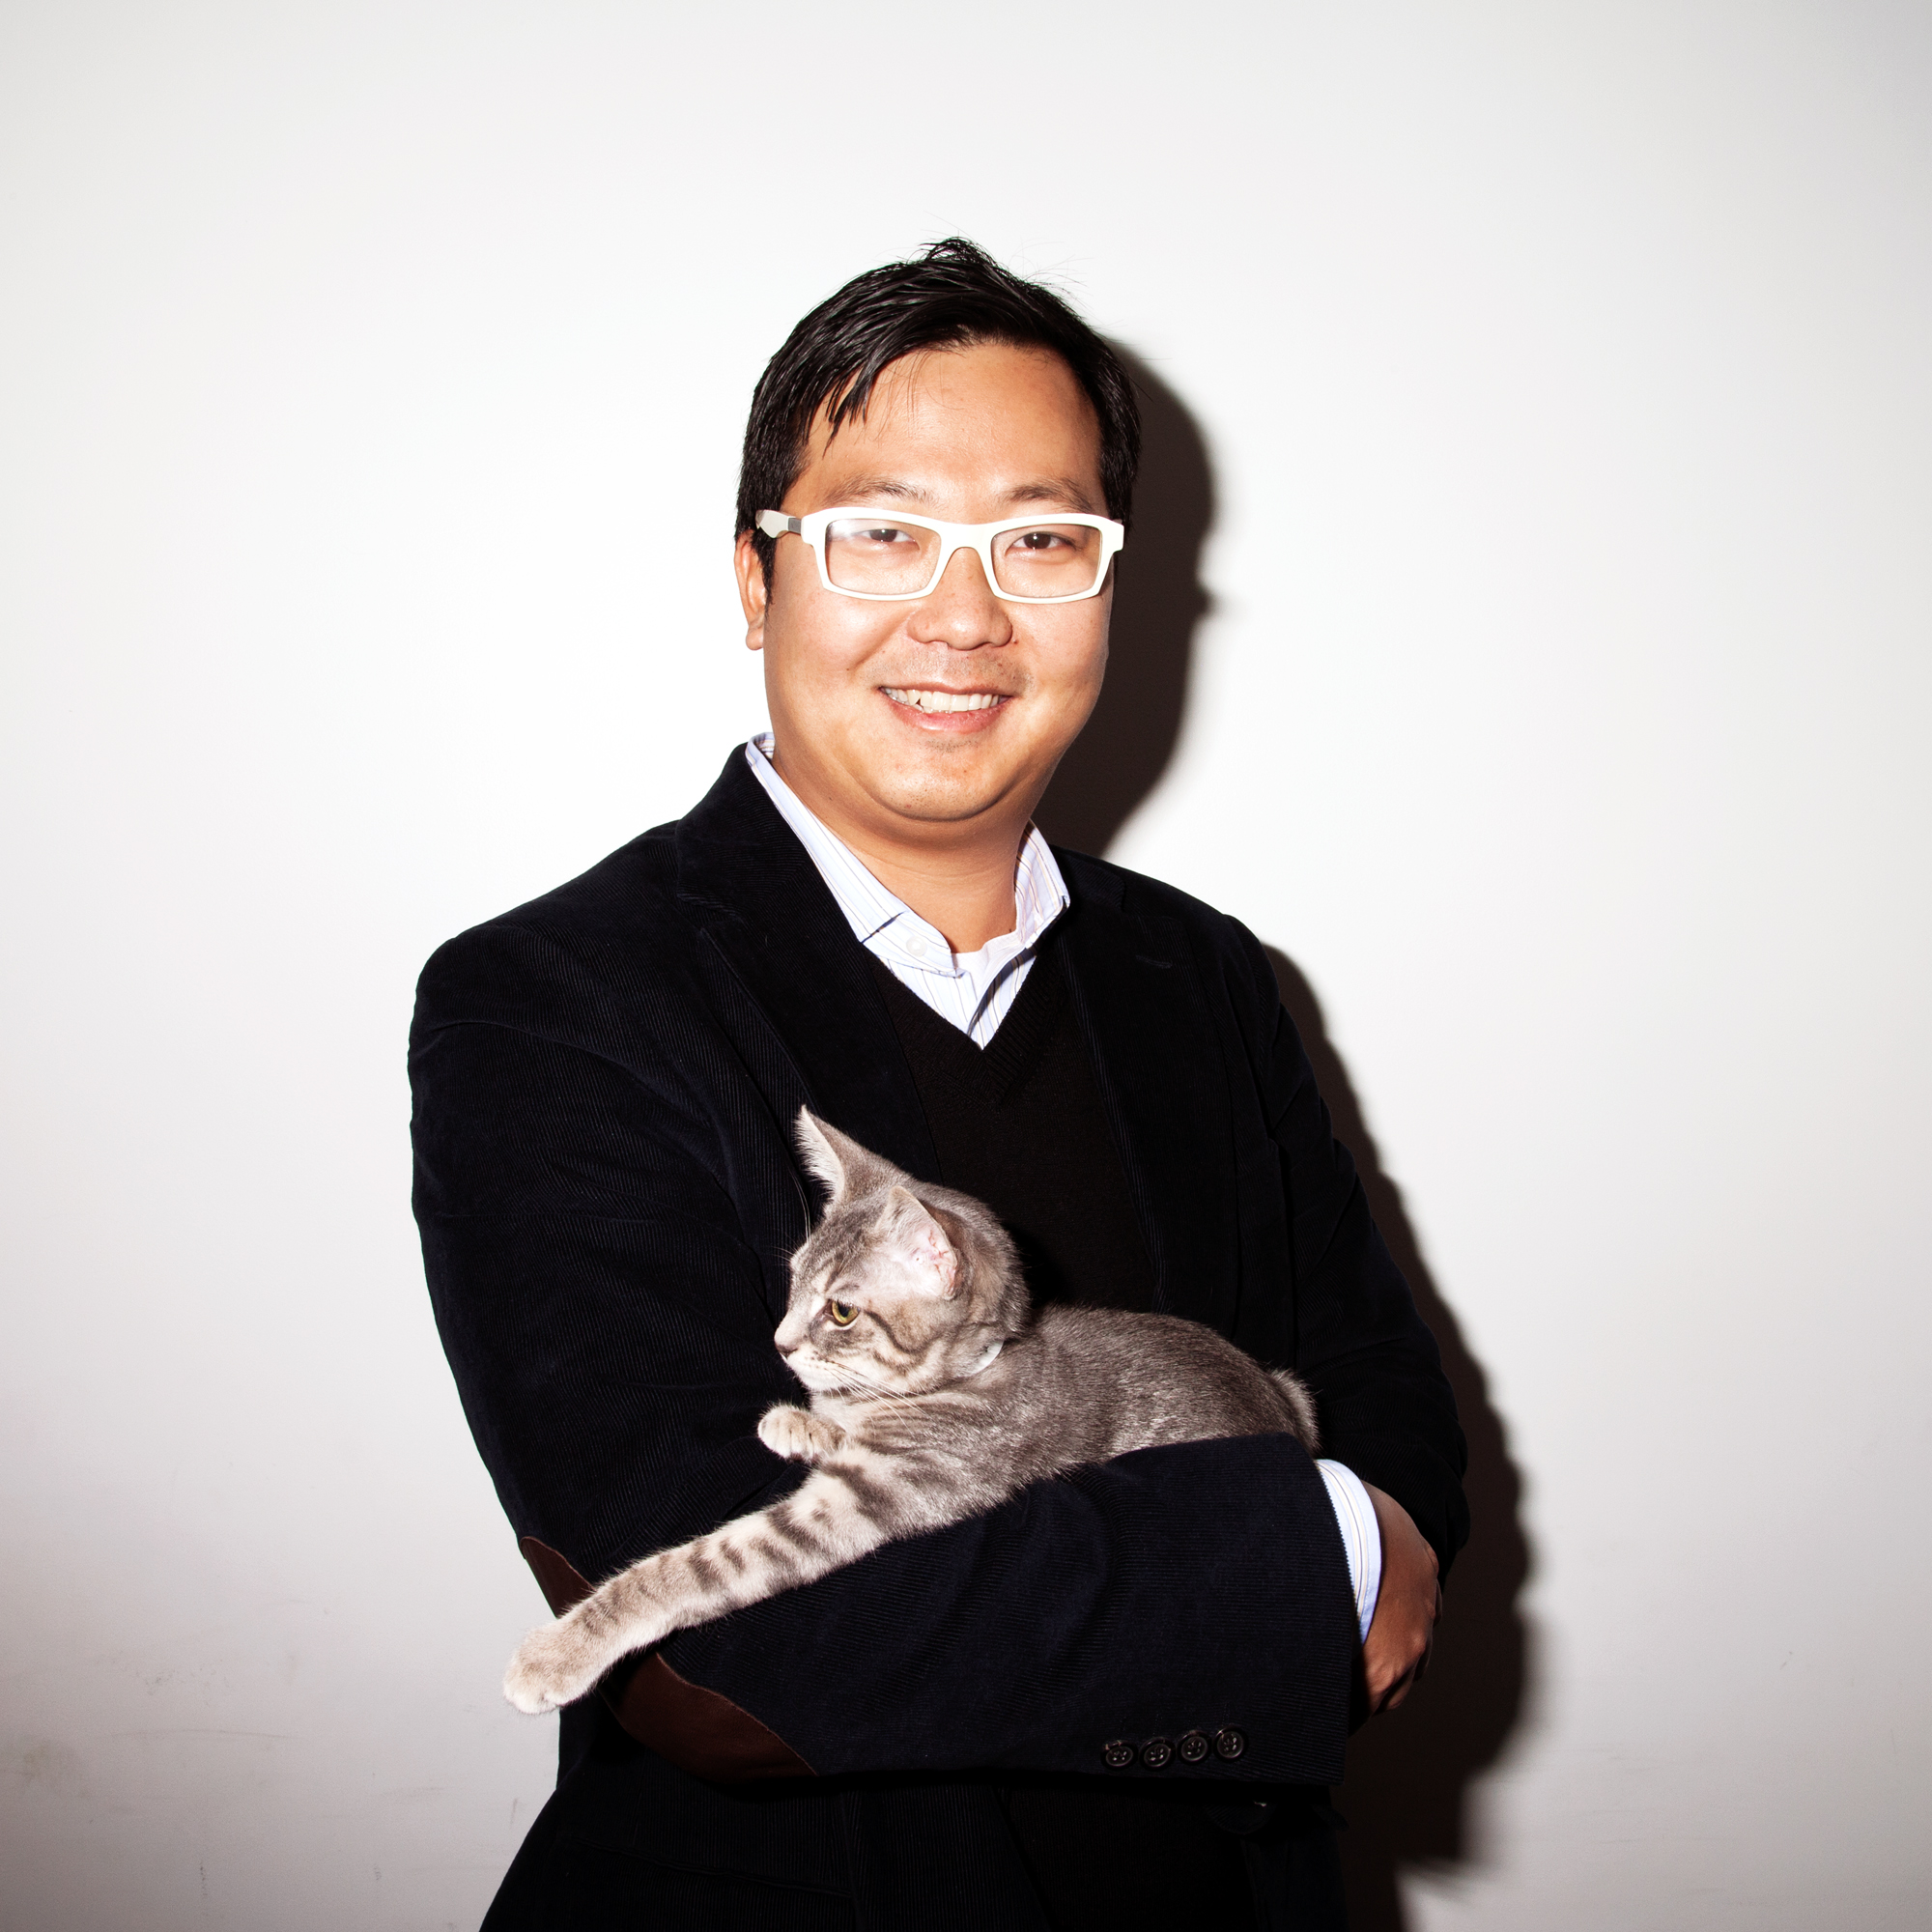 Ben Huh, CEO of The Cheezburger Network